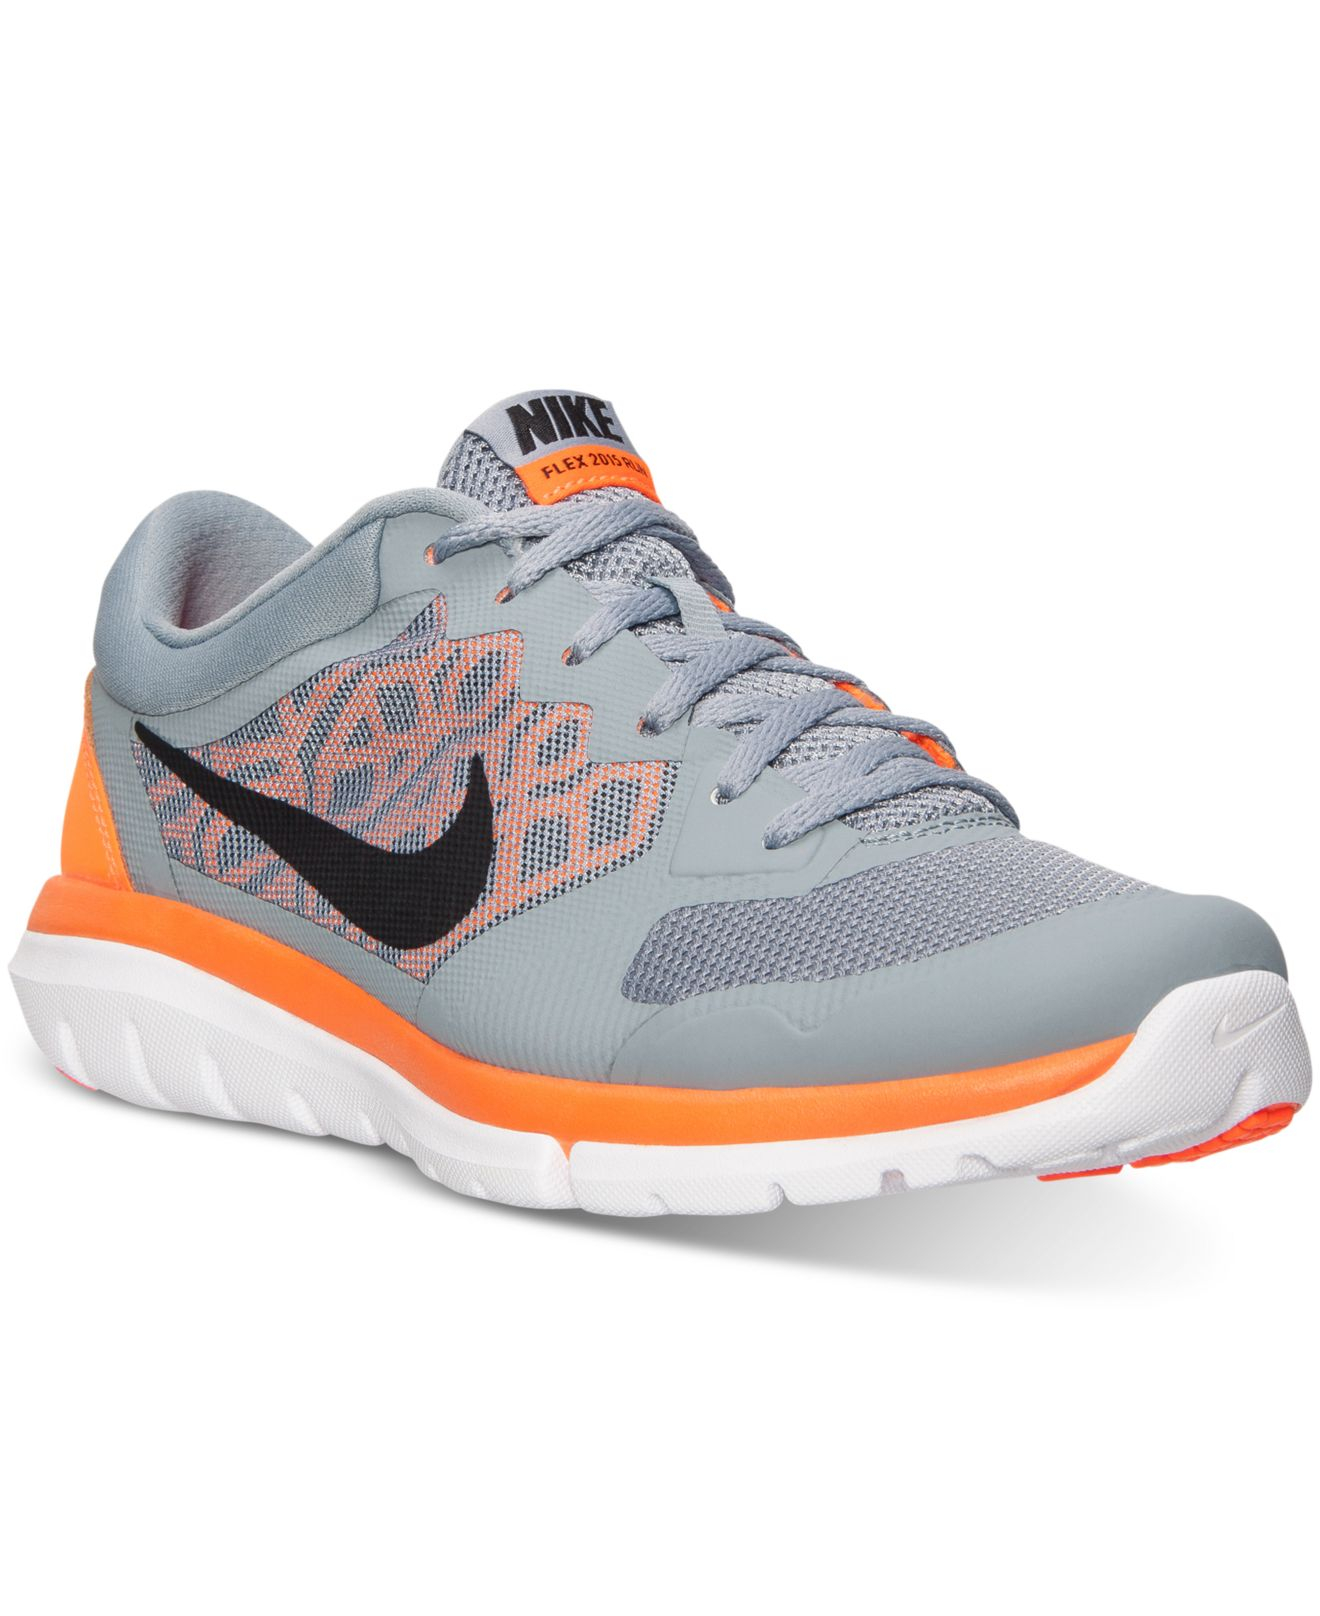 Nike Mens Fitsole Shoes